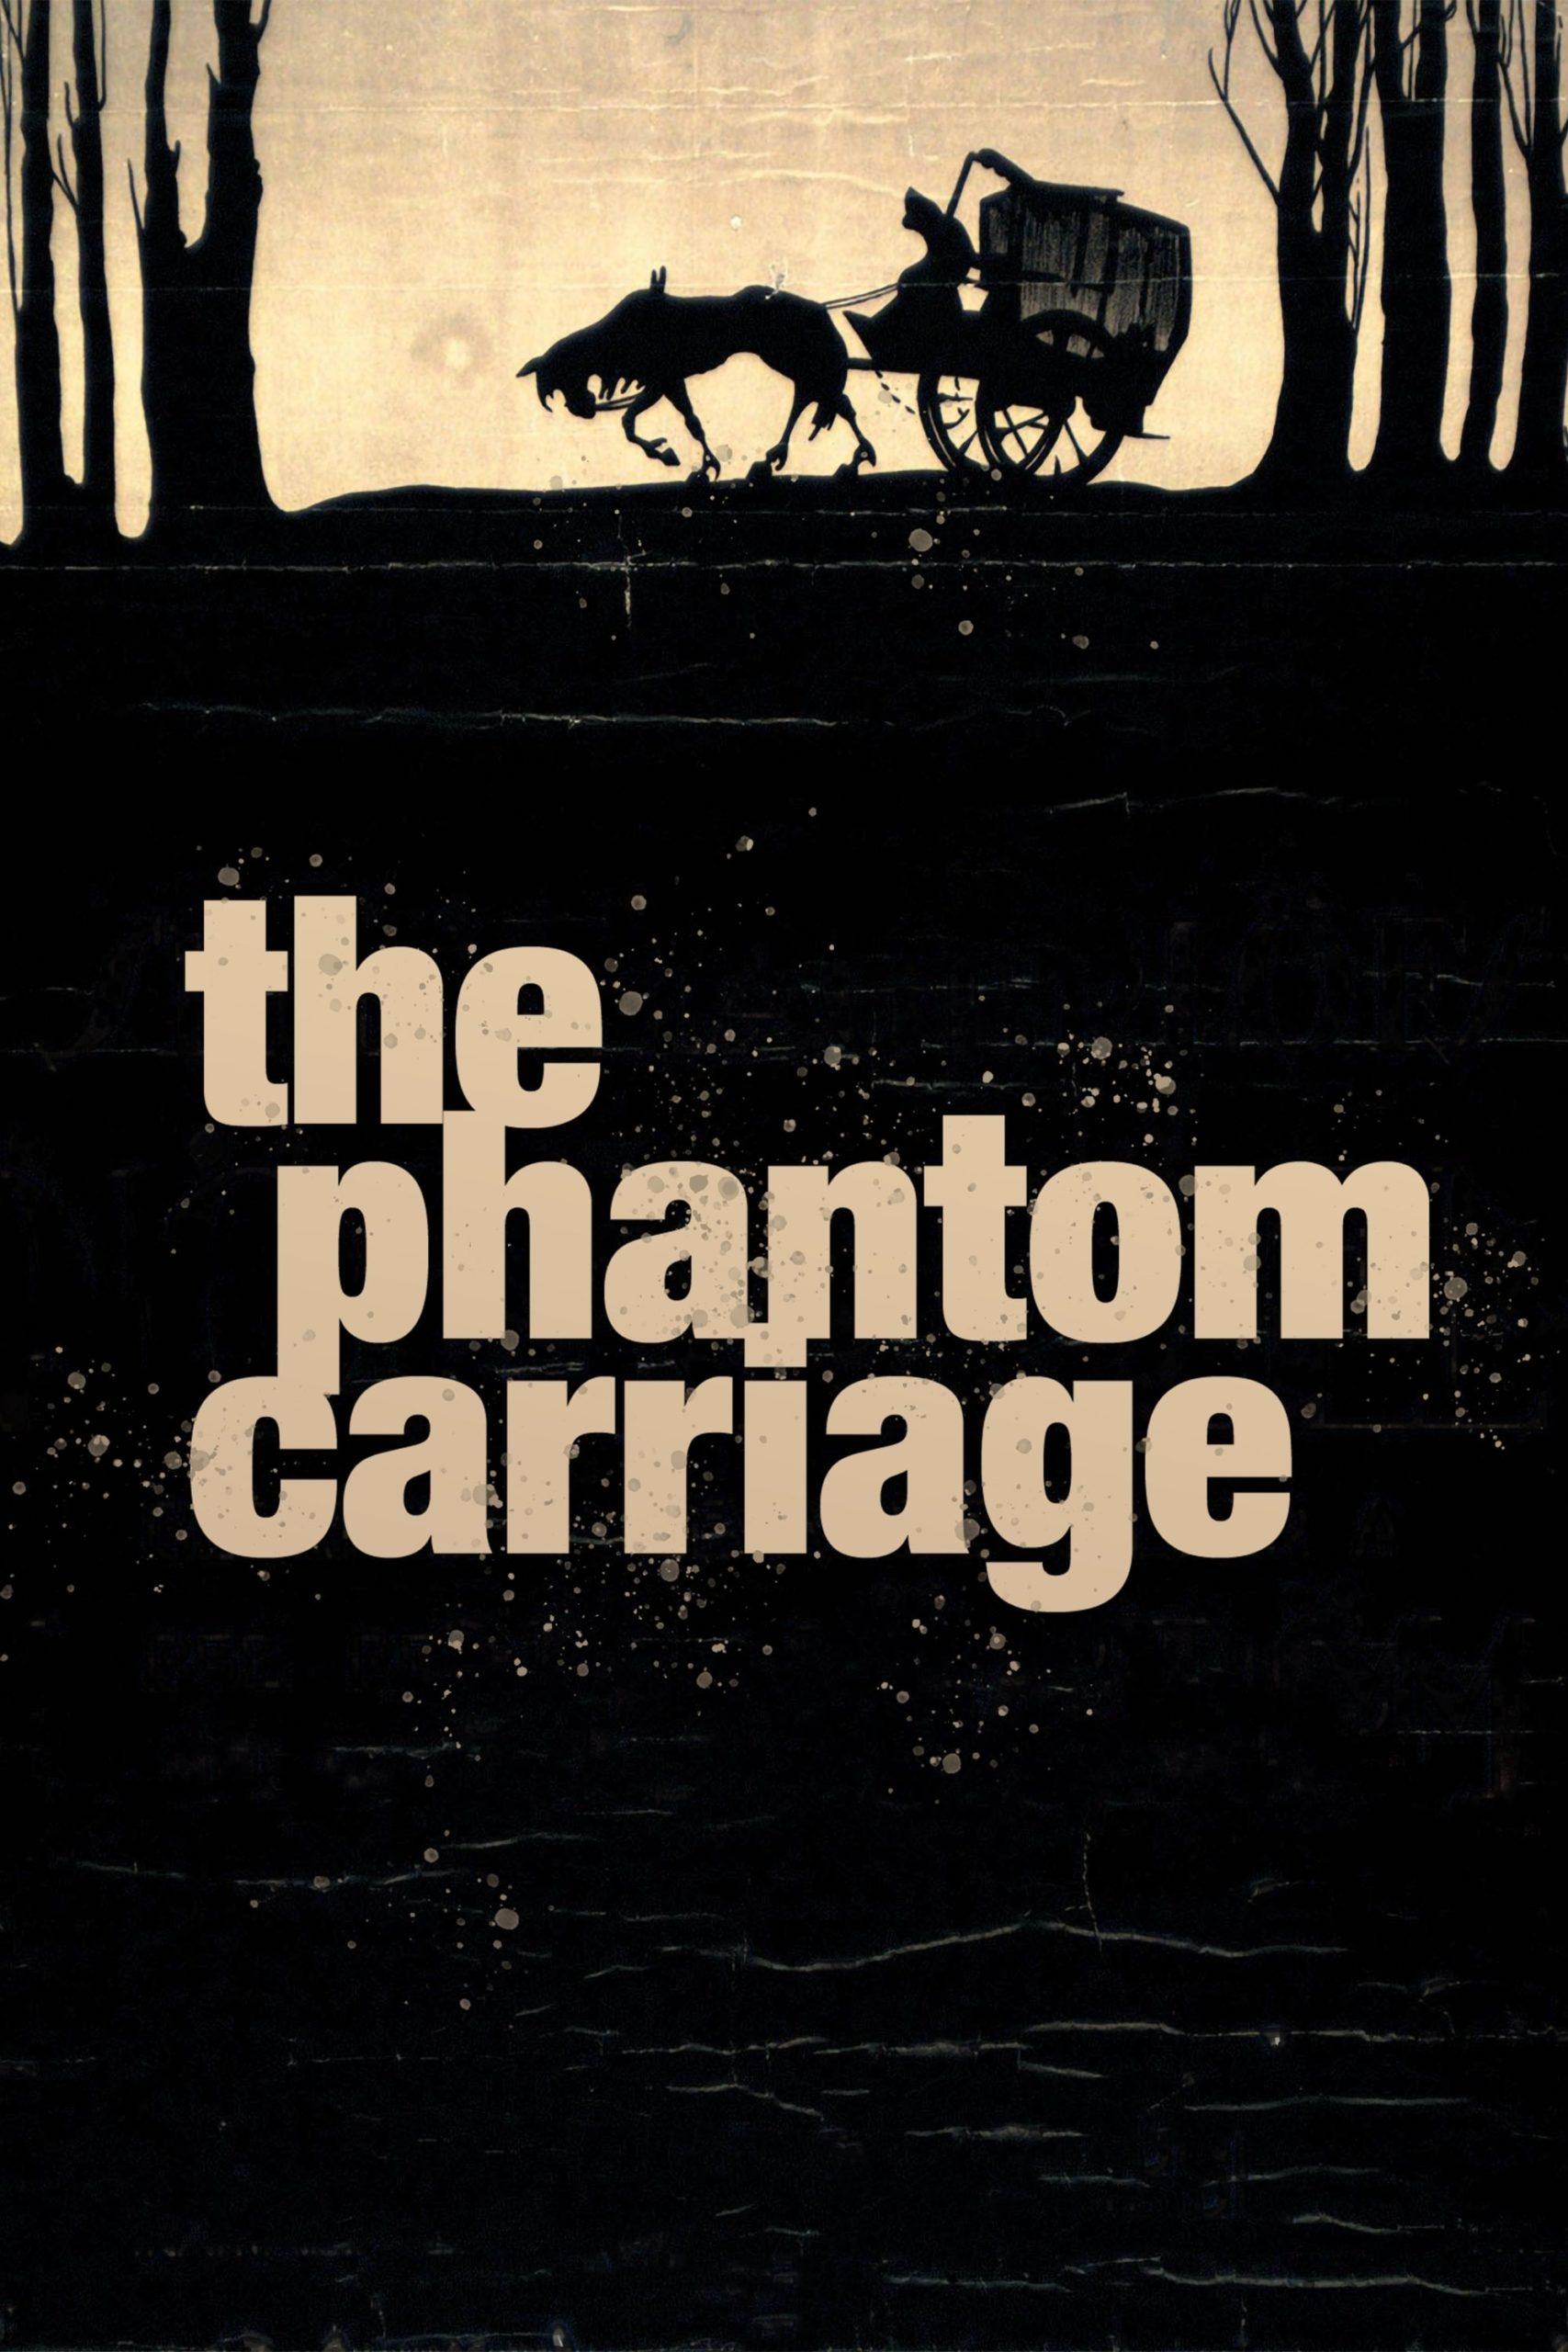 The Phantom Carriage – Körkarlen (1921)